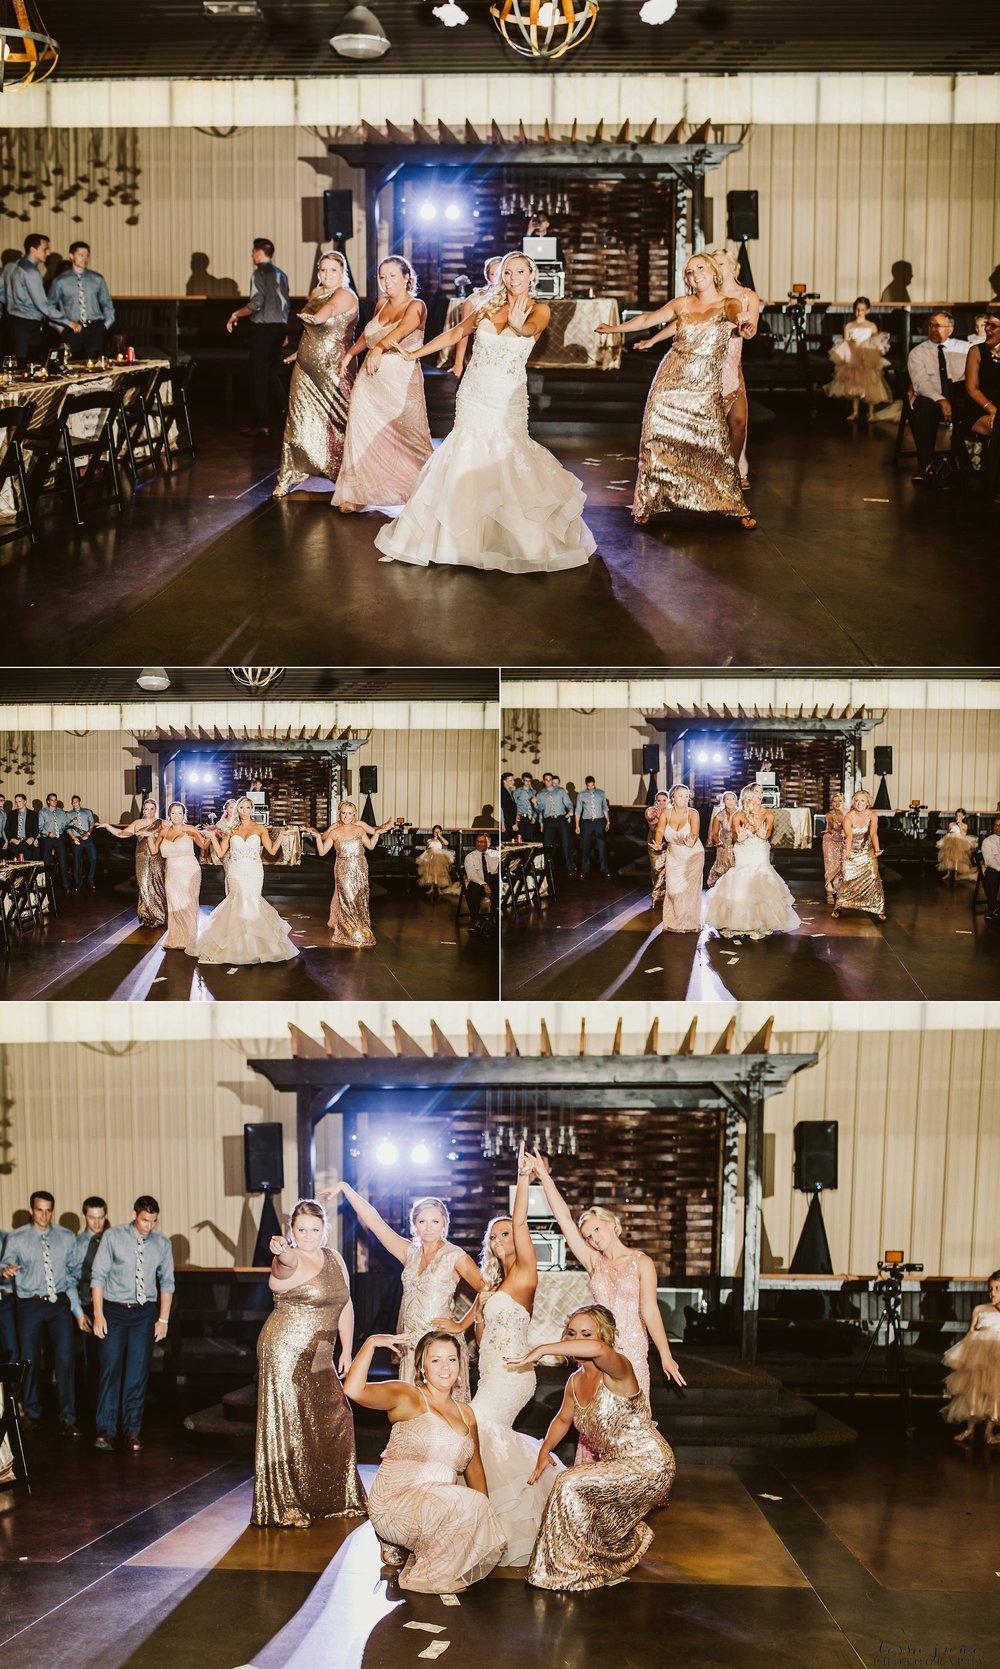 carlos-creek-winery-wedding-alexandria-minnesota-glam-elegant-floral-143.jpg